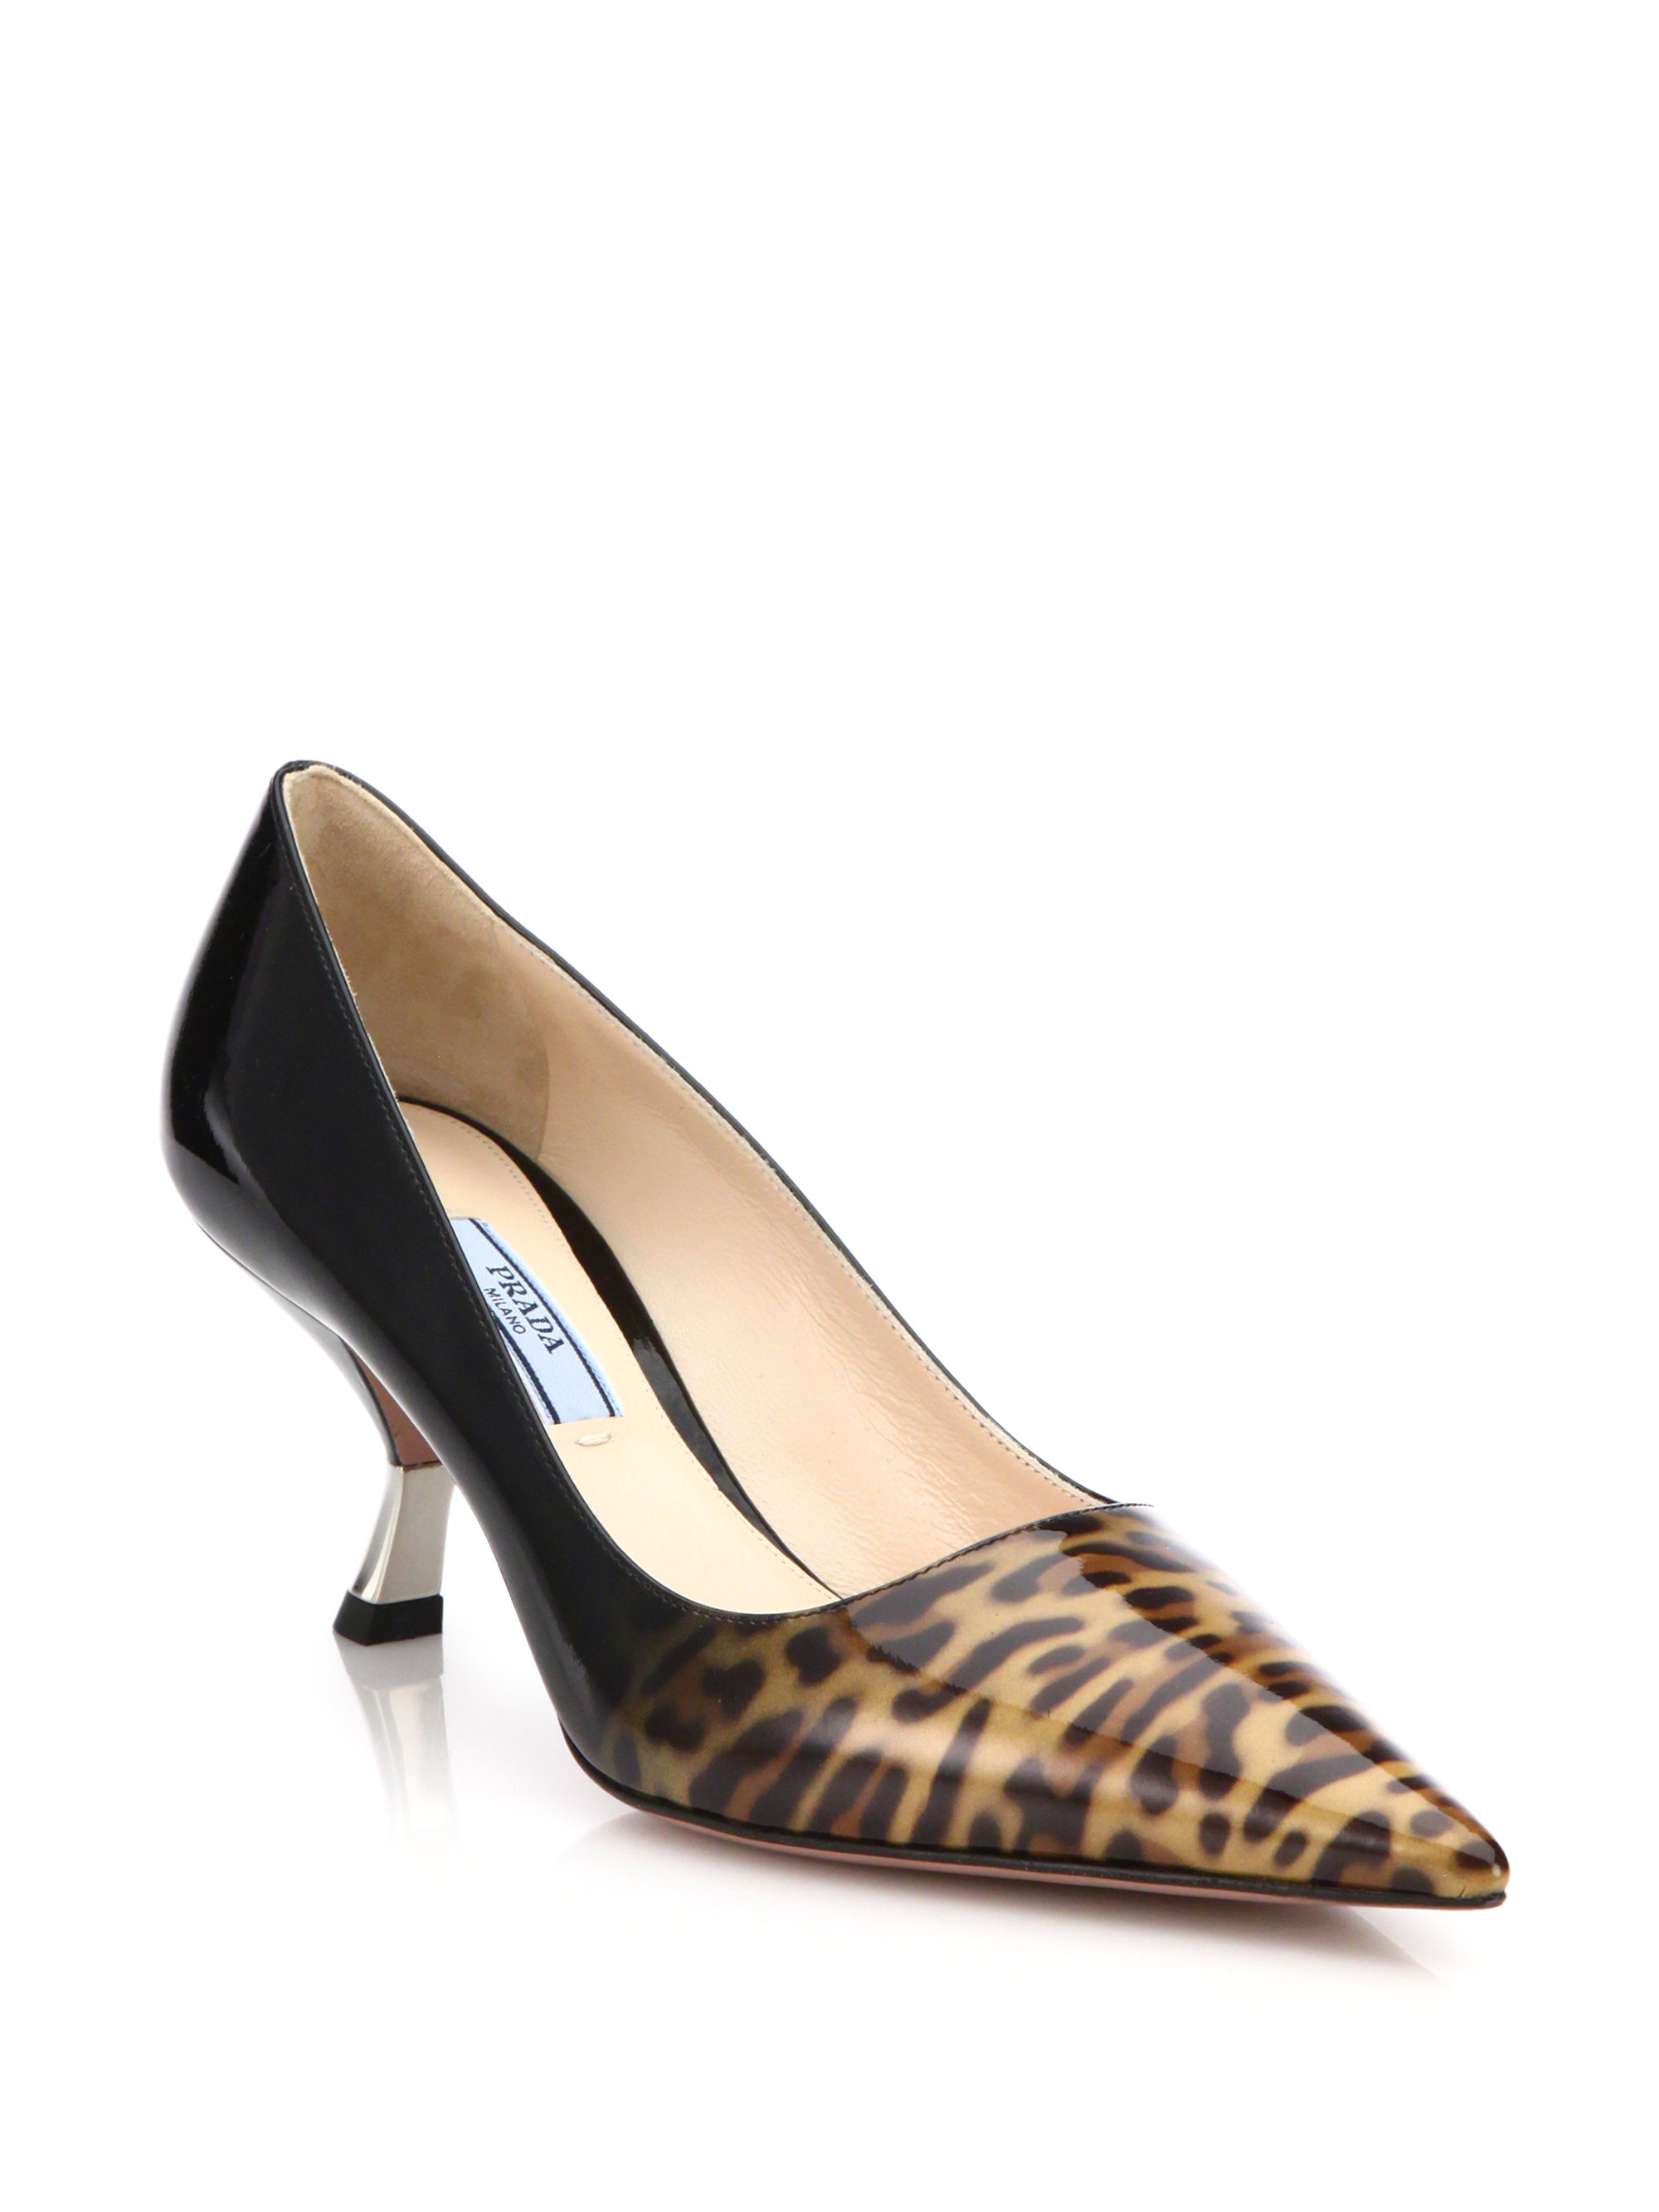 Printed High Heel Shoes